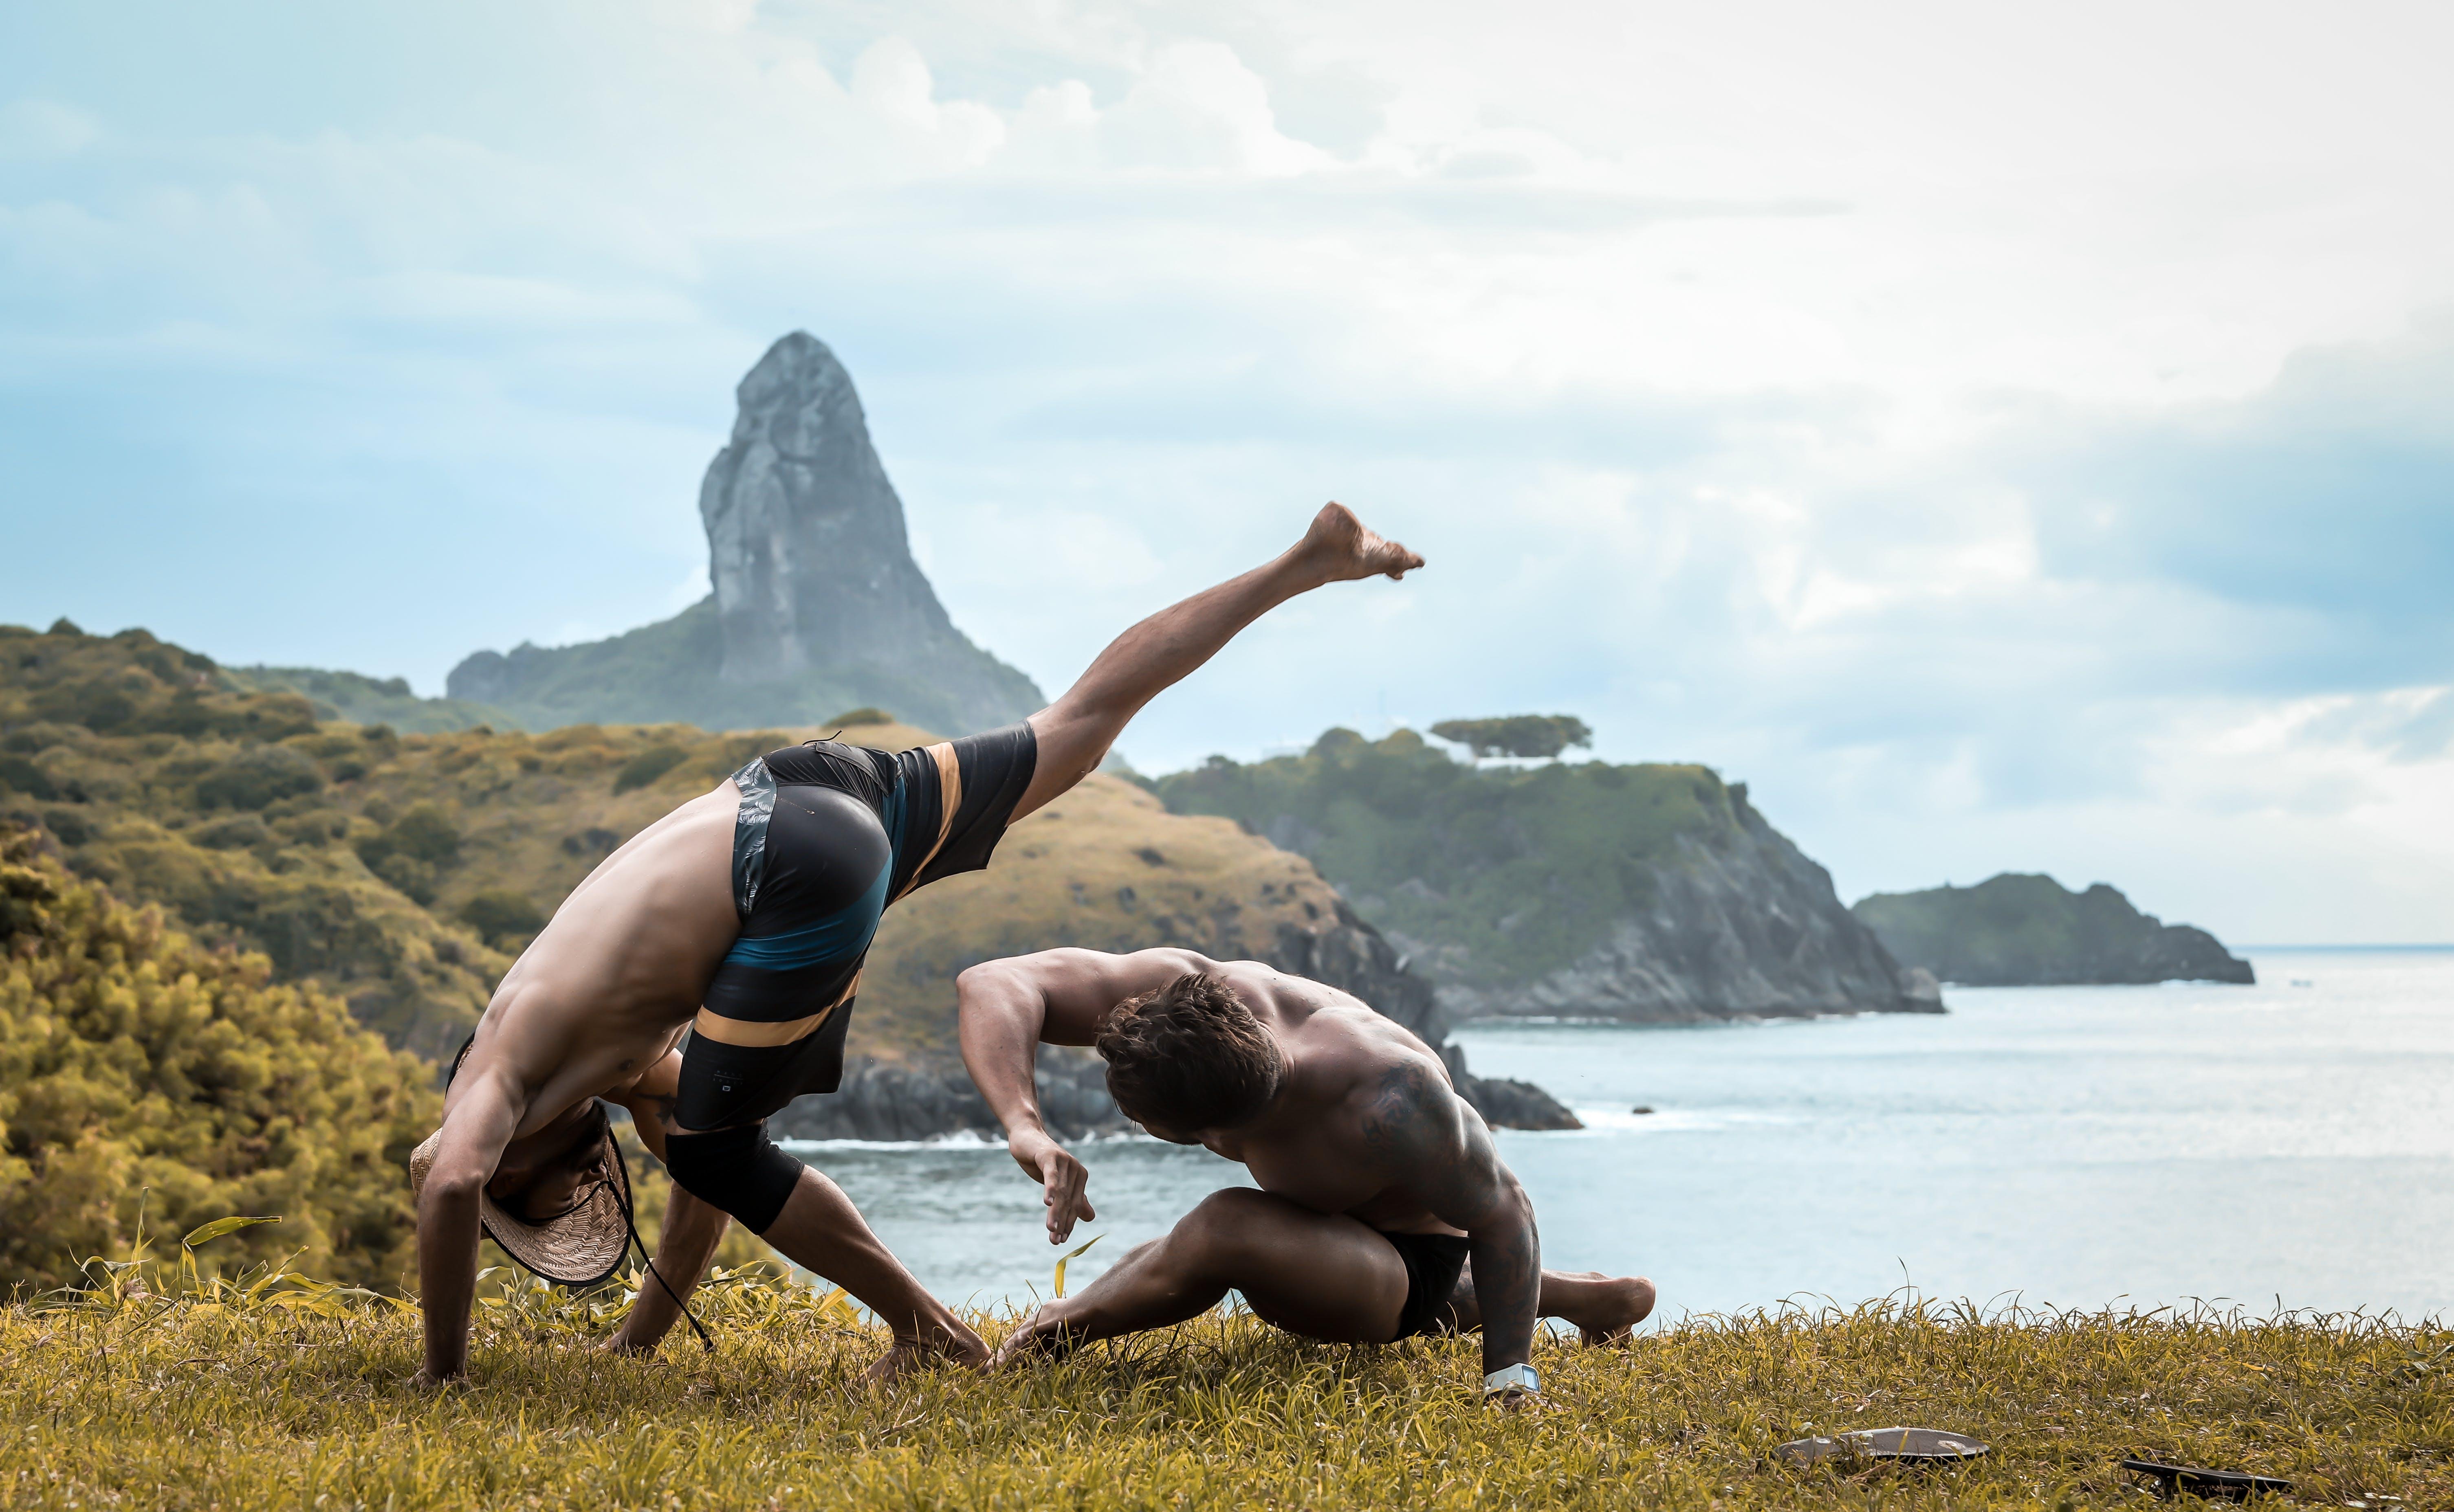 2 Men Performing Capoeira on Grass